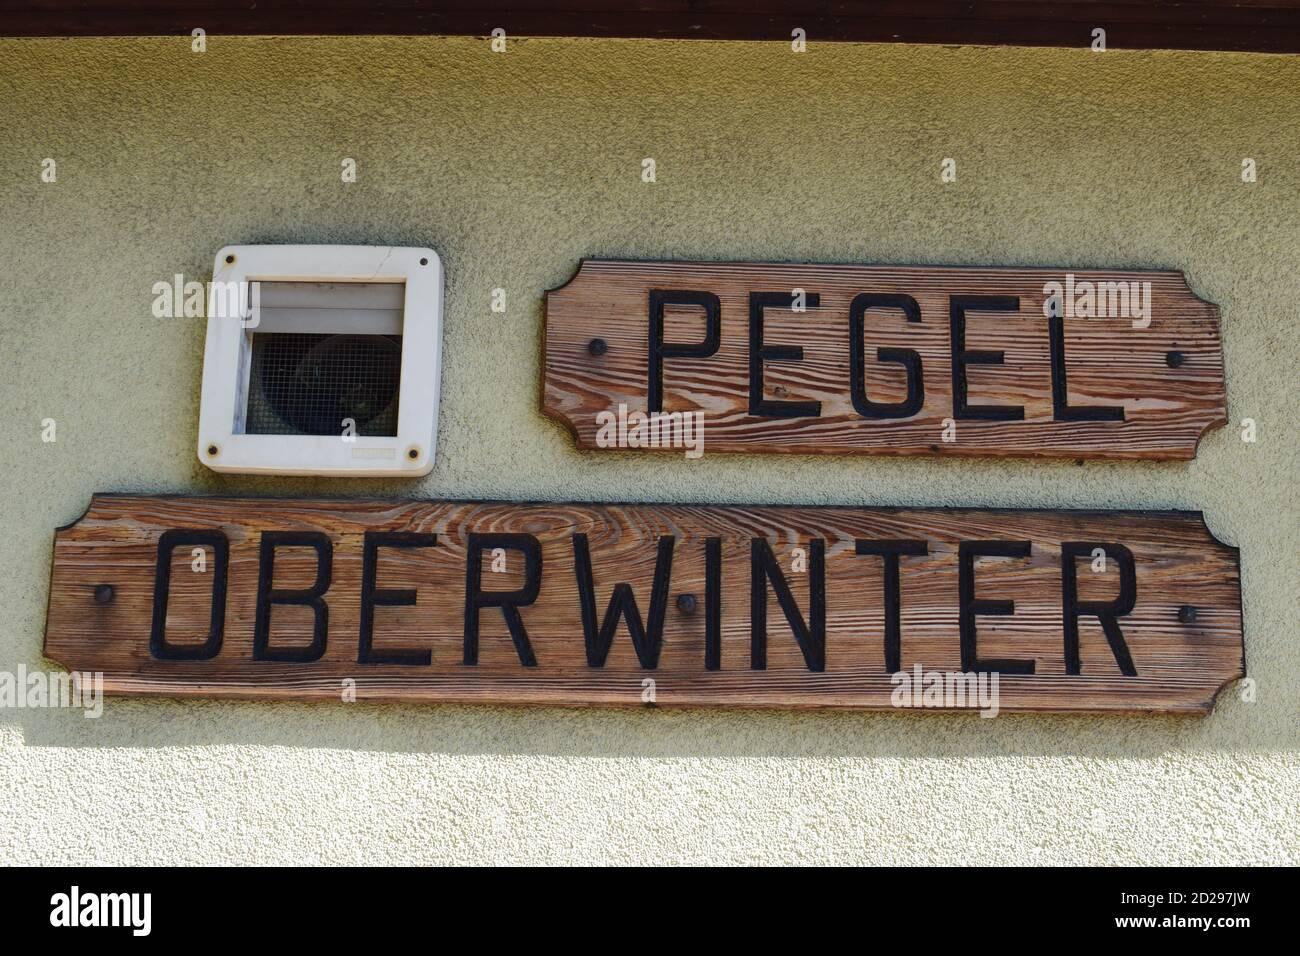 Pegel Oberwinter Stock Photo